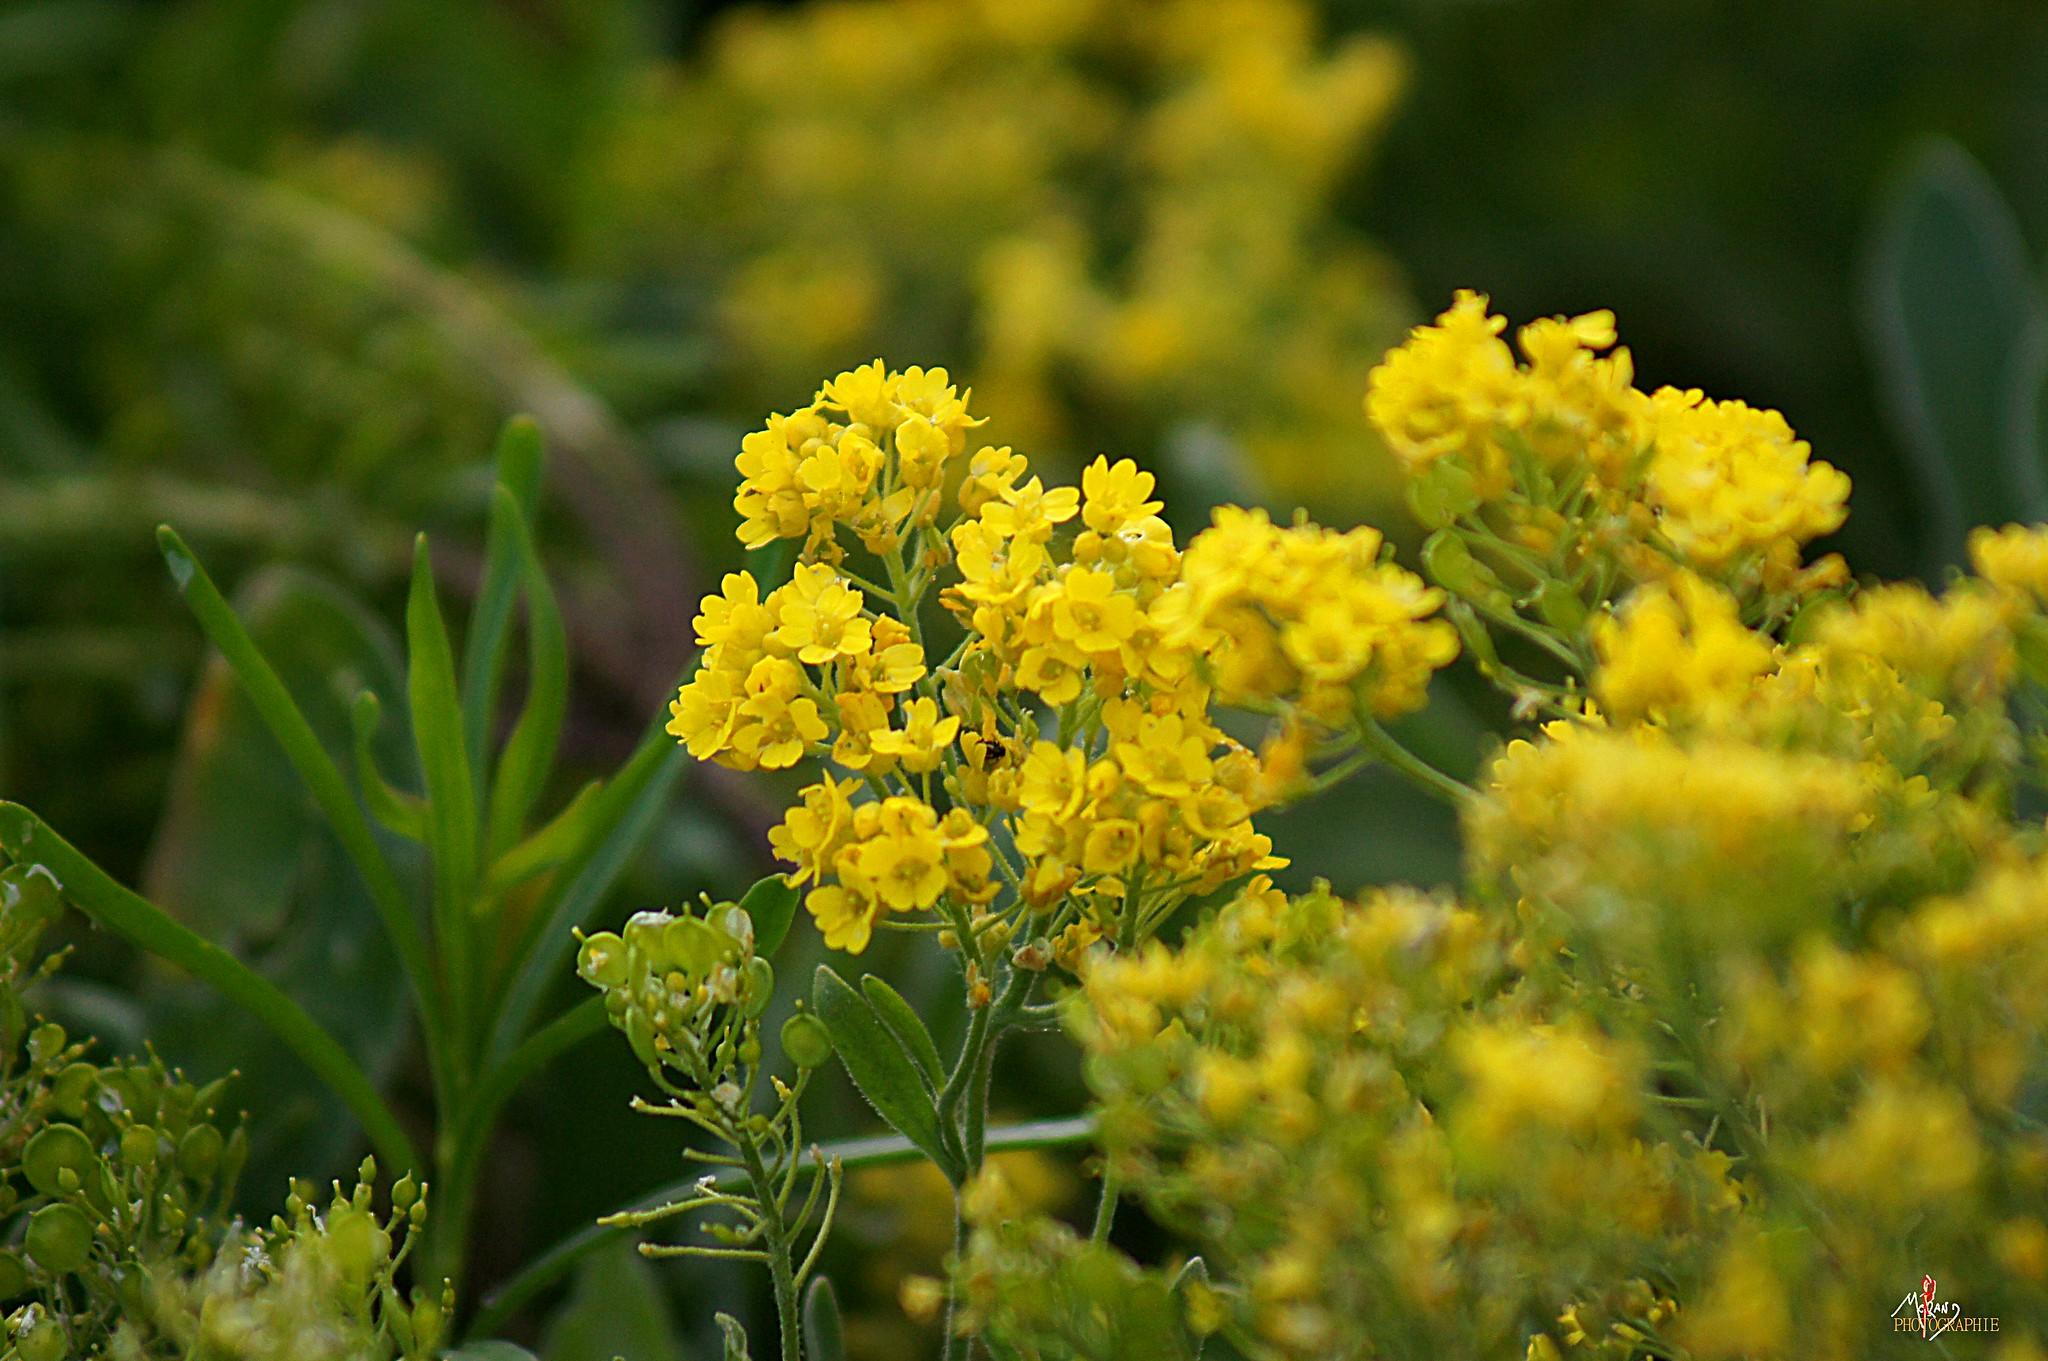 Fleurs jaune printemps flickr photo sharing - Arbuste fleurs jaunes printemps ...